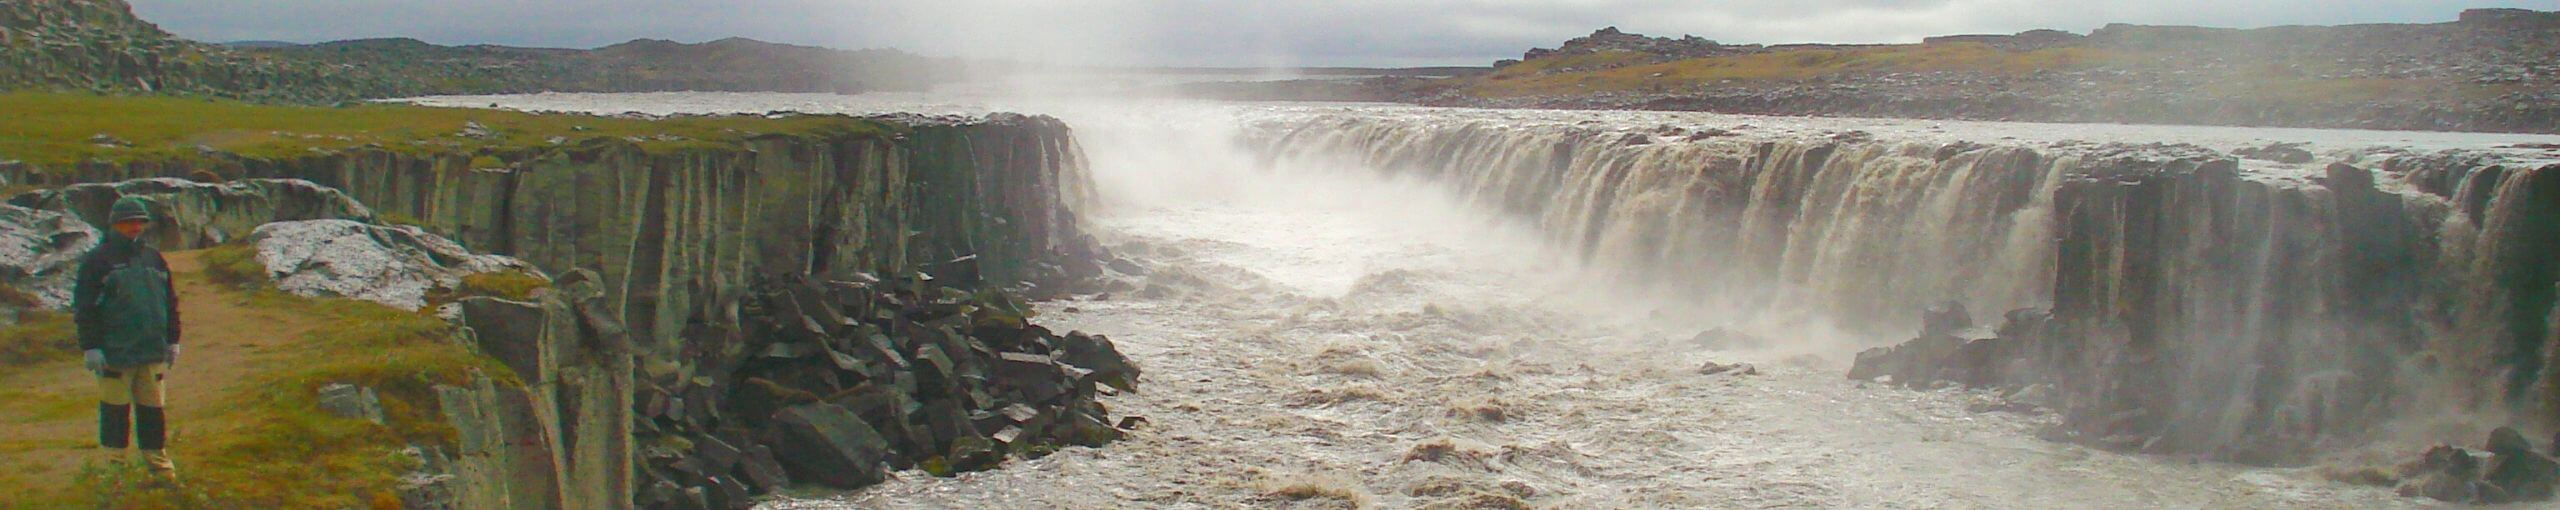 Jökulsárgljúfur Cascada Dettifoss. Islandia.